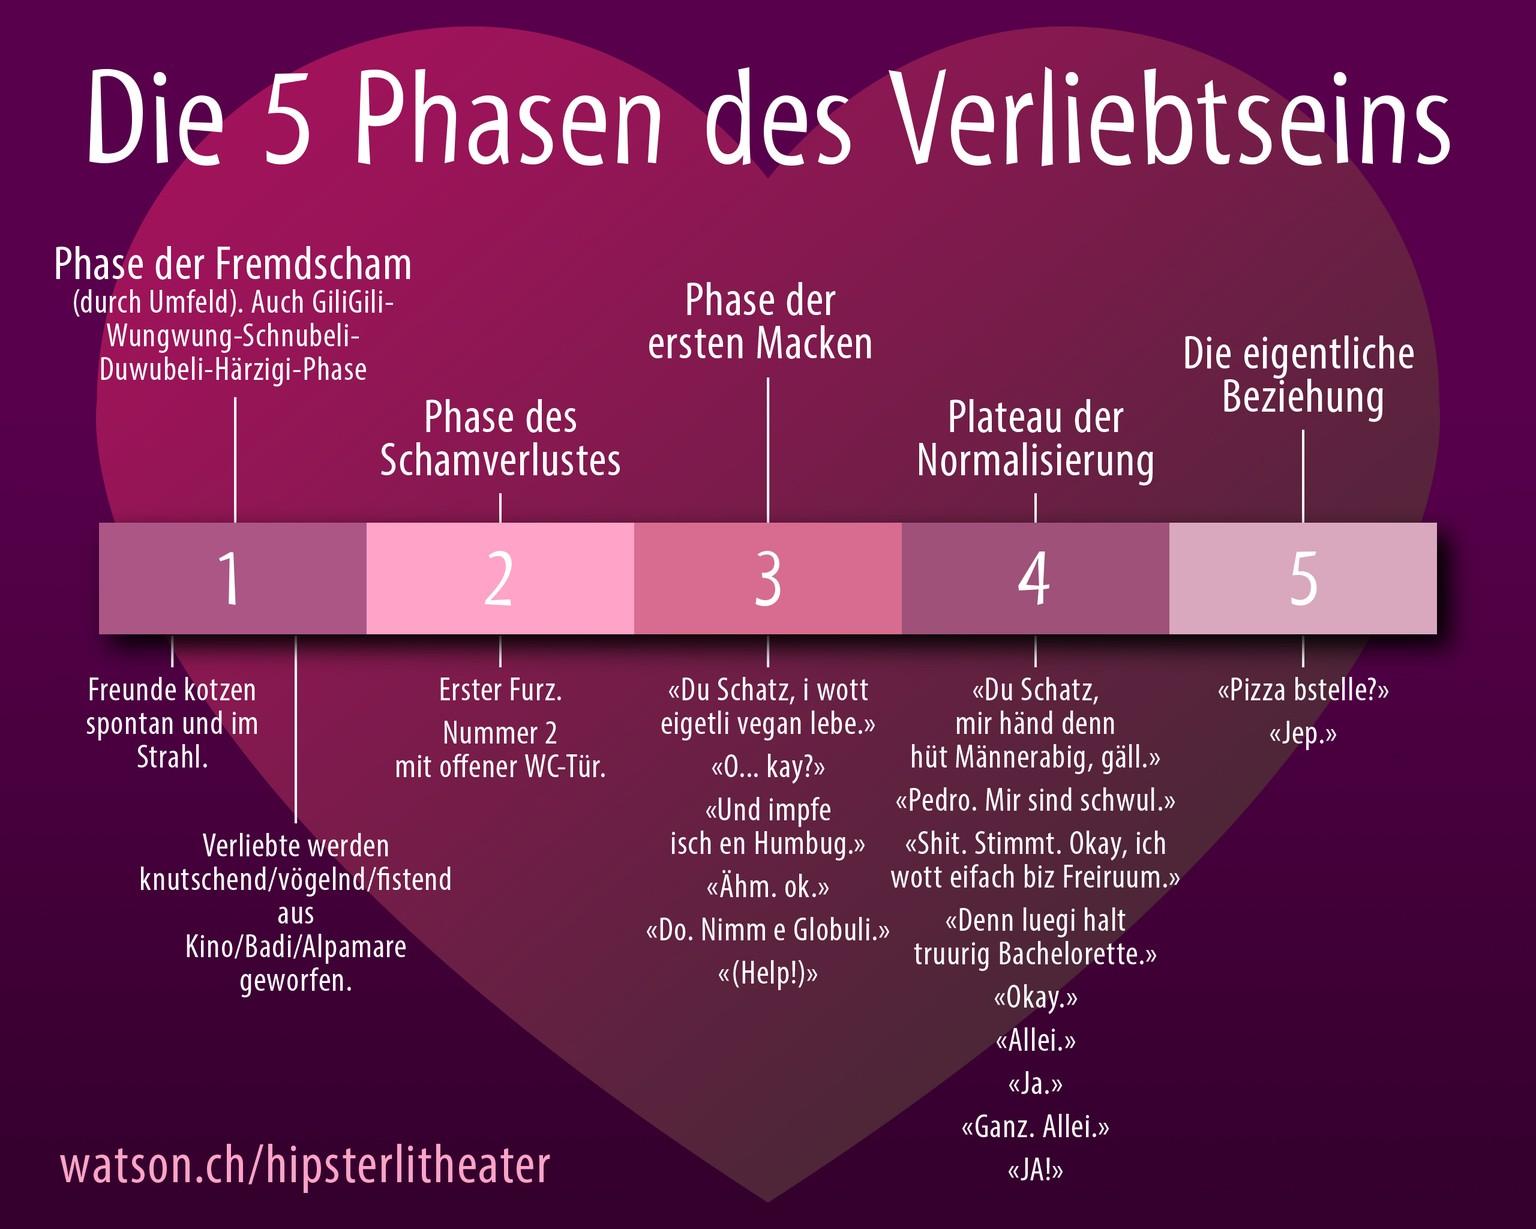 5 phasen